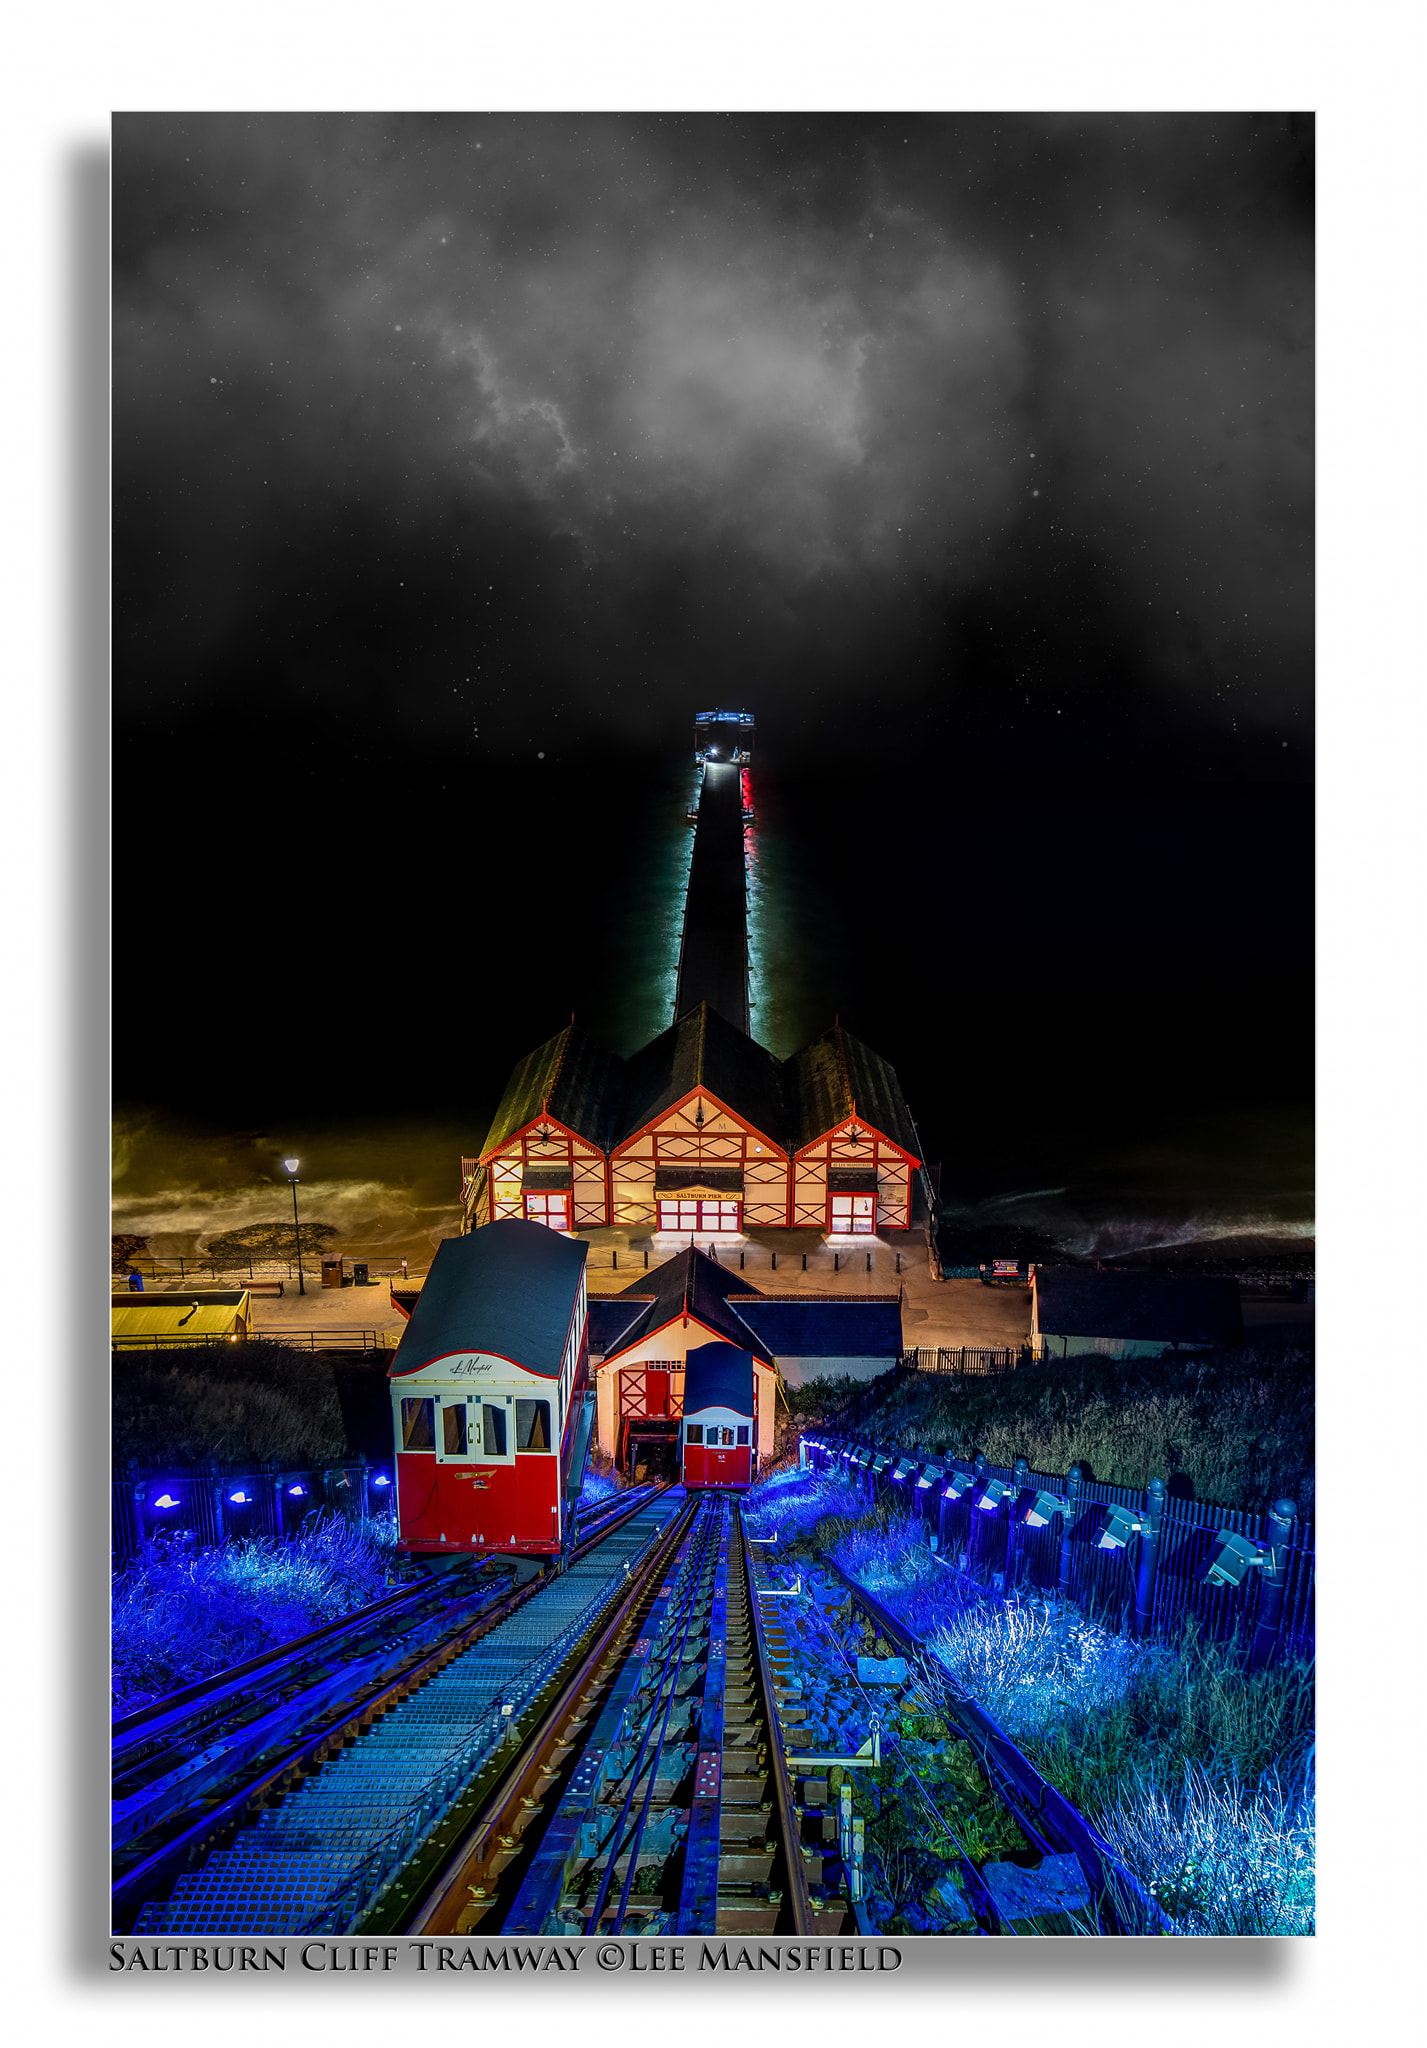 Saltburn Cliff Tramway - Saltburn-by-the-Sea - night long exposure